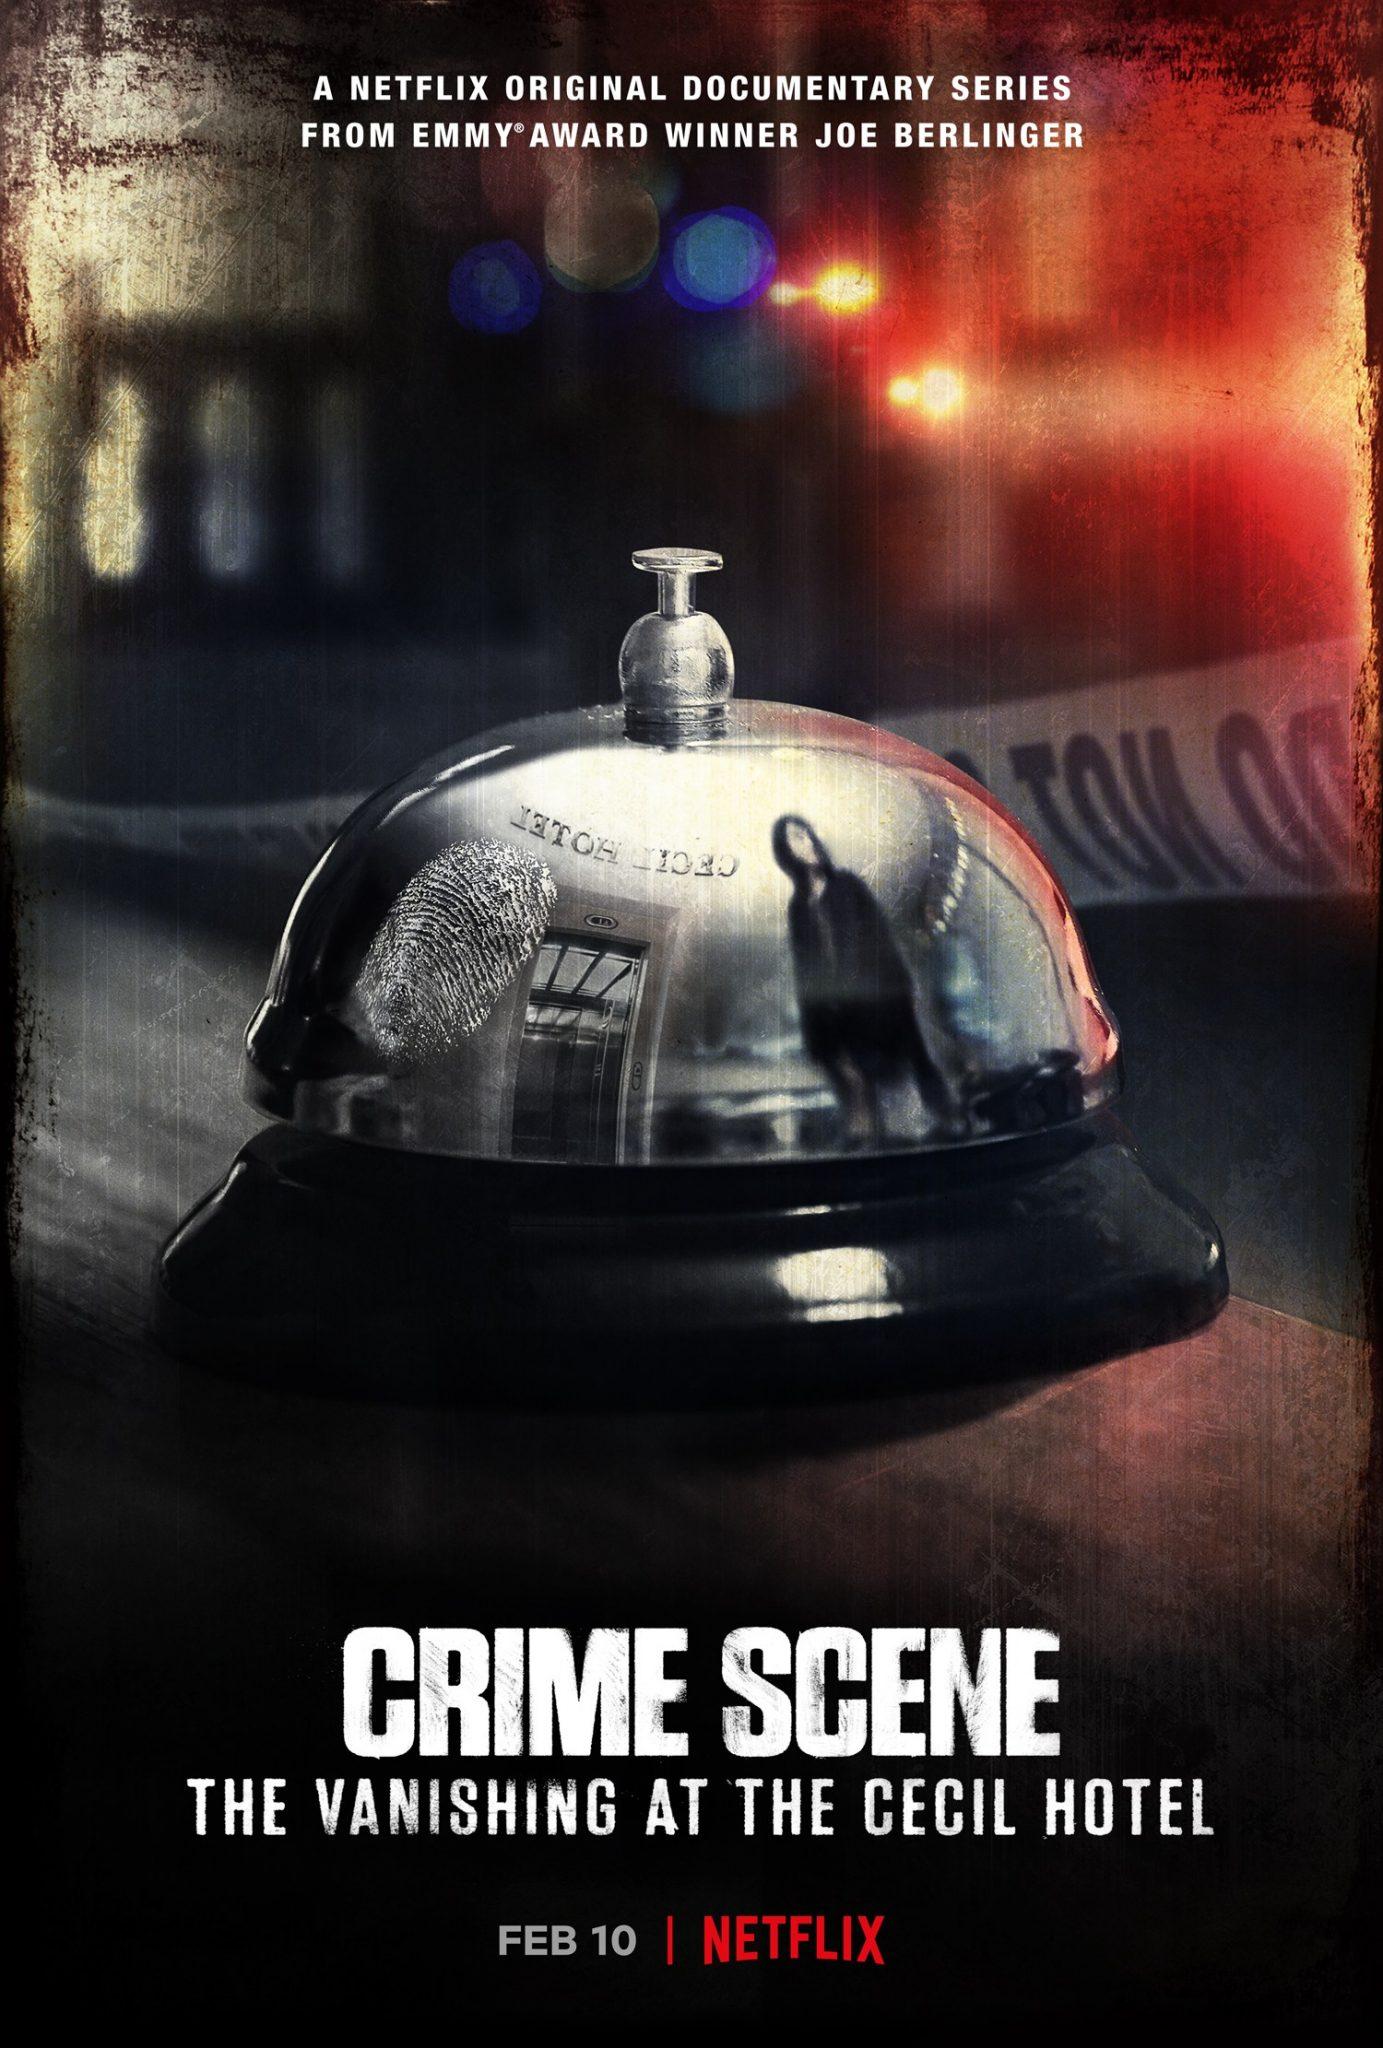 EN US Crime Scene Cecil Hotel S1 Main Vertical 27x40 RGB PRE scaled